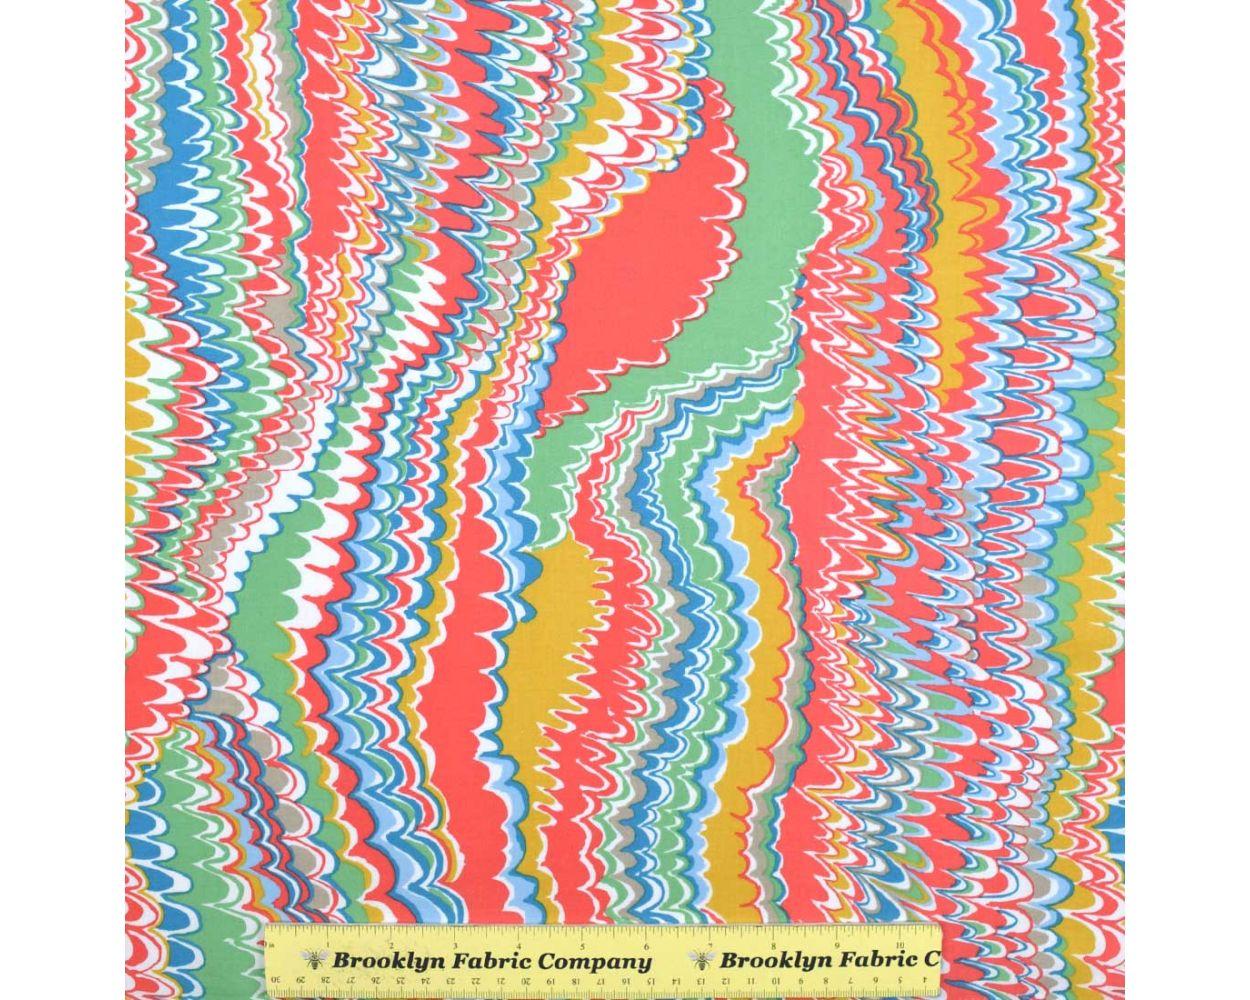 Kaffe Fassett Fall 2016 NEW PWGP159 End Papers MELON Collective Swirls New BTHY Rowan Westminster Fasset Half Yard 18 Quilt Fabric